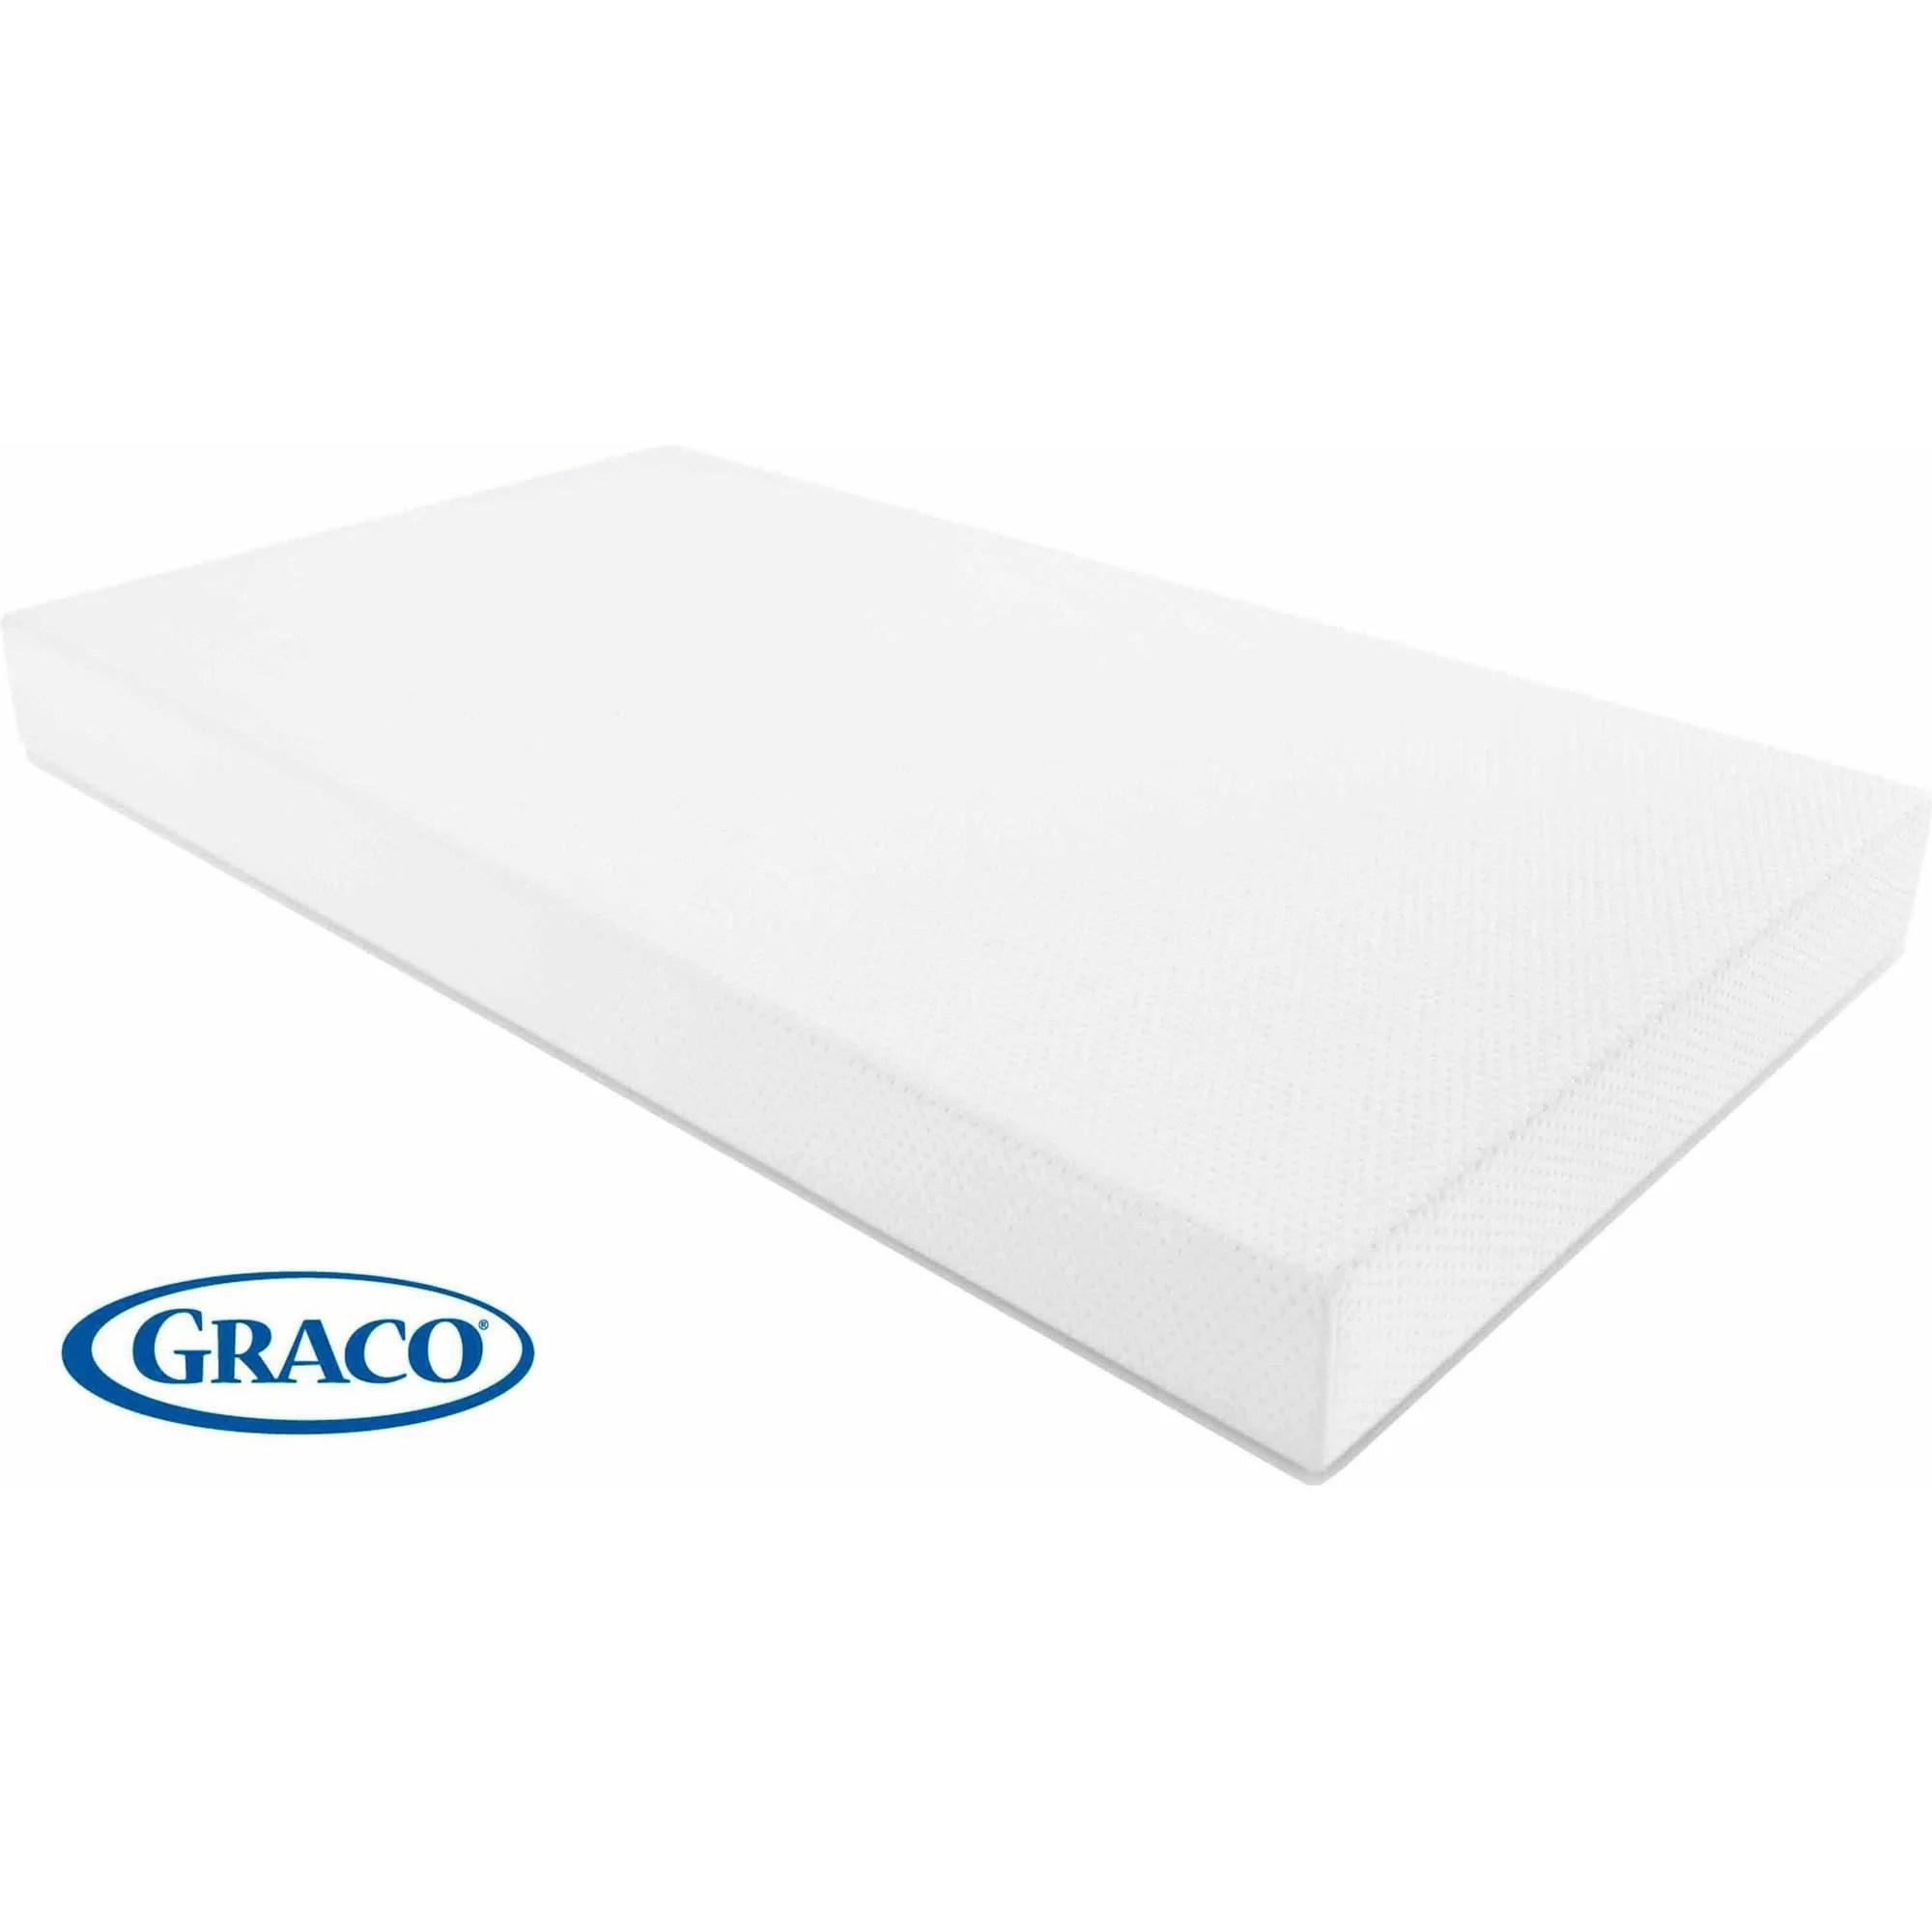 Graco Premium Crib And Toddler Bed Mattress Foam